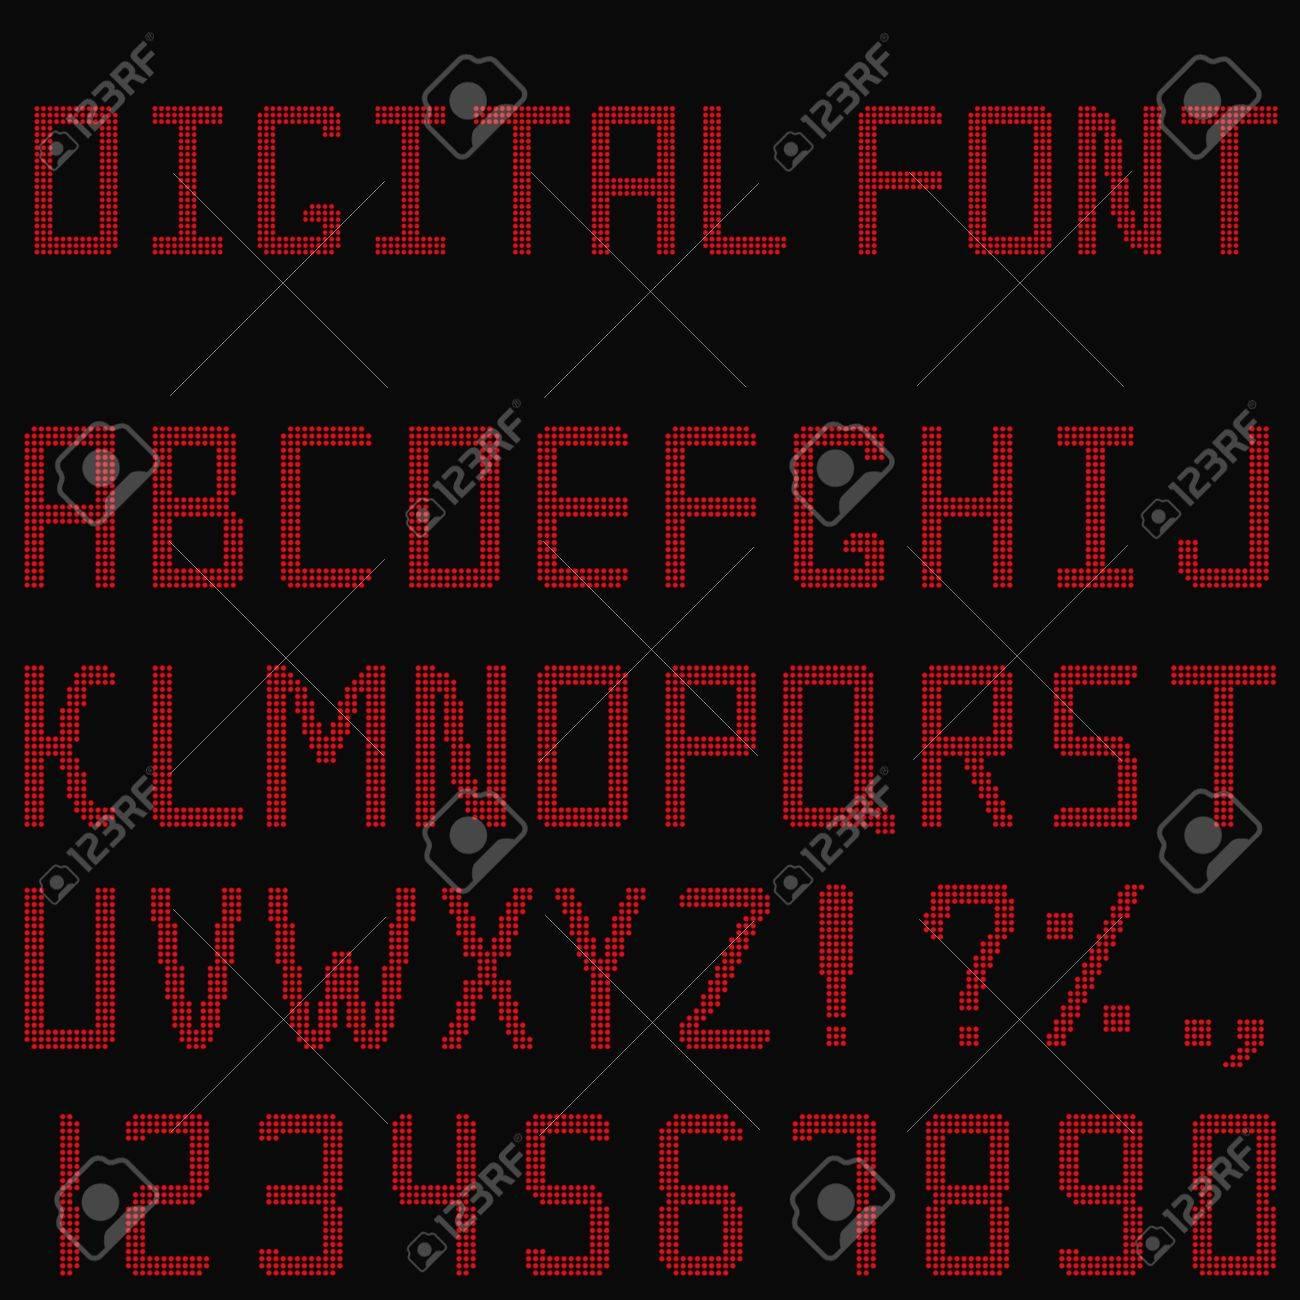 Vector Red Digital Font Stock Vector - 10746796